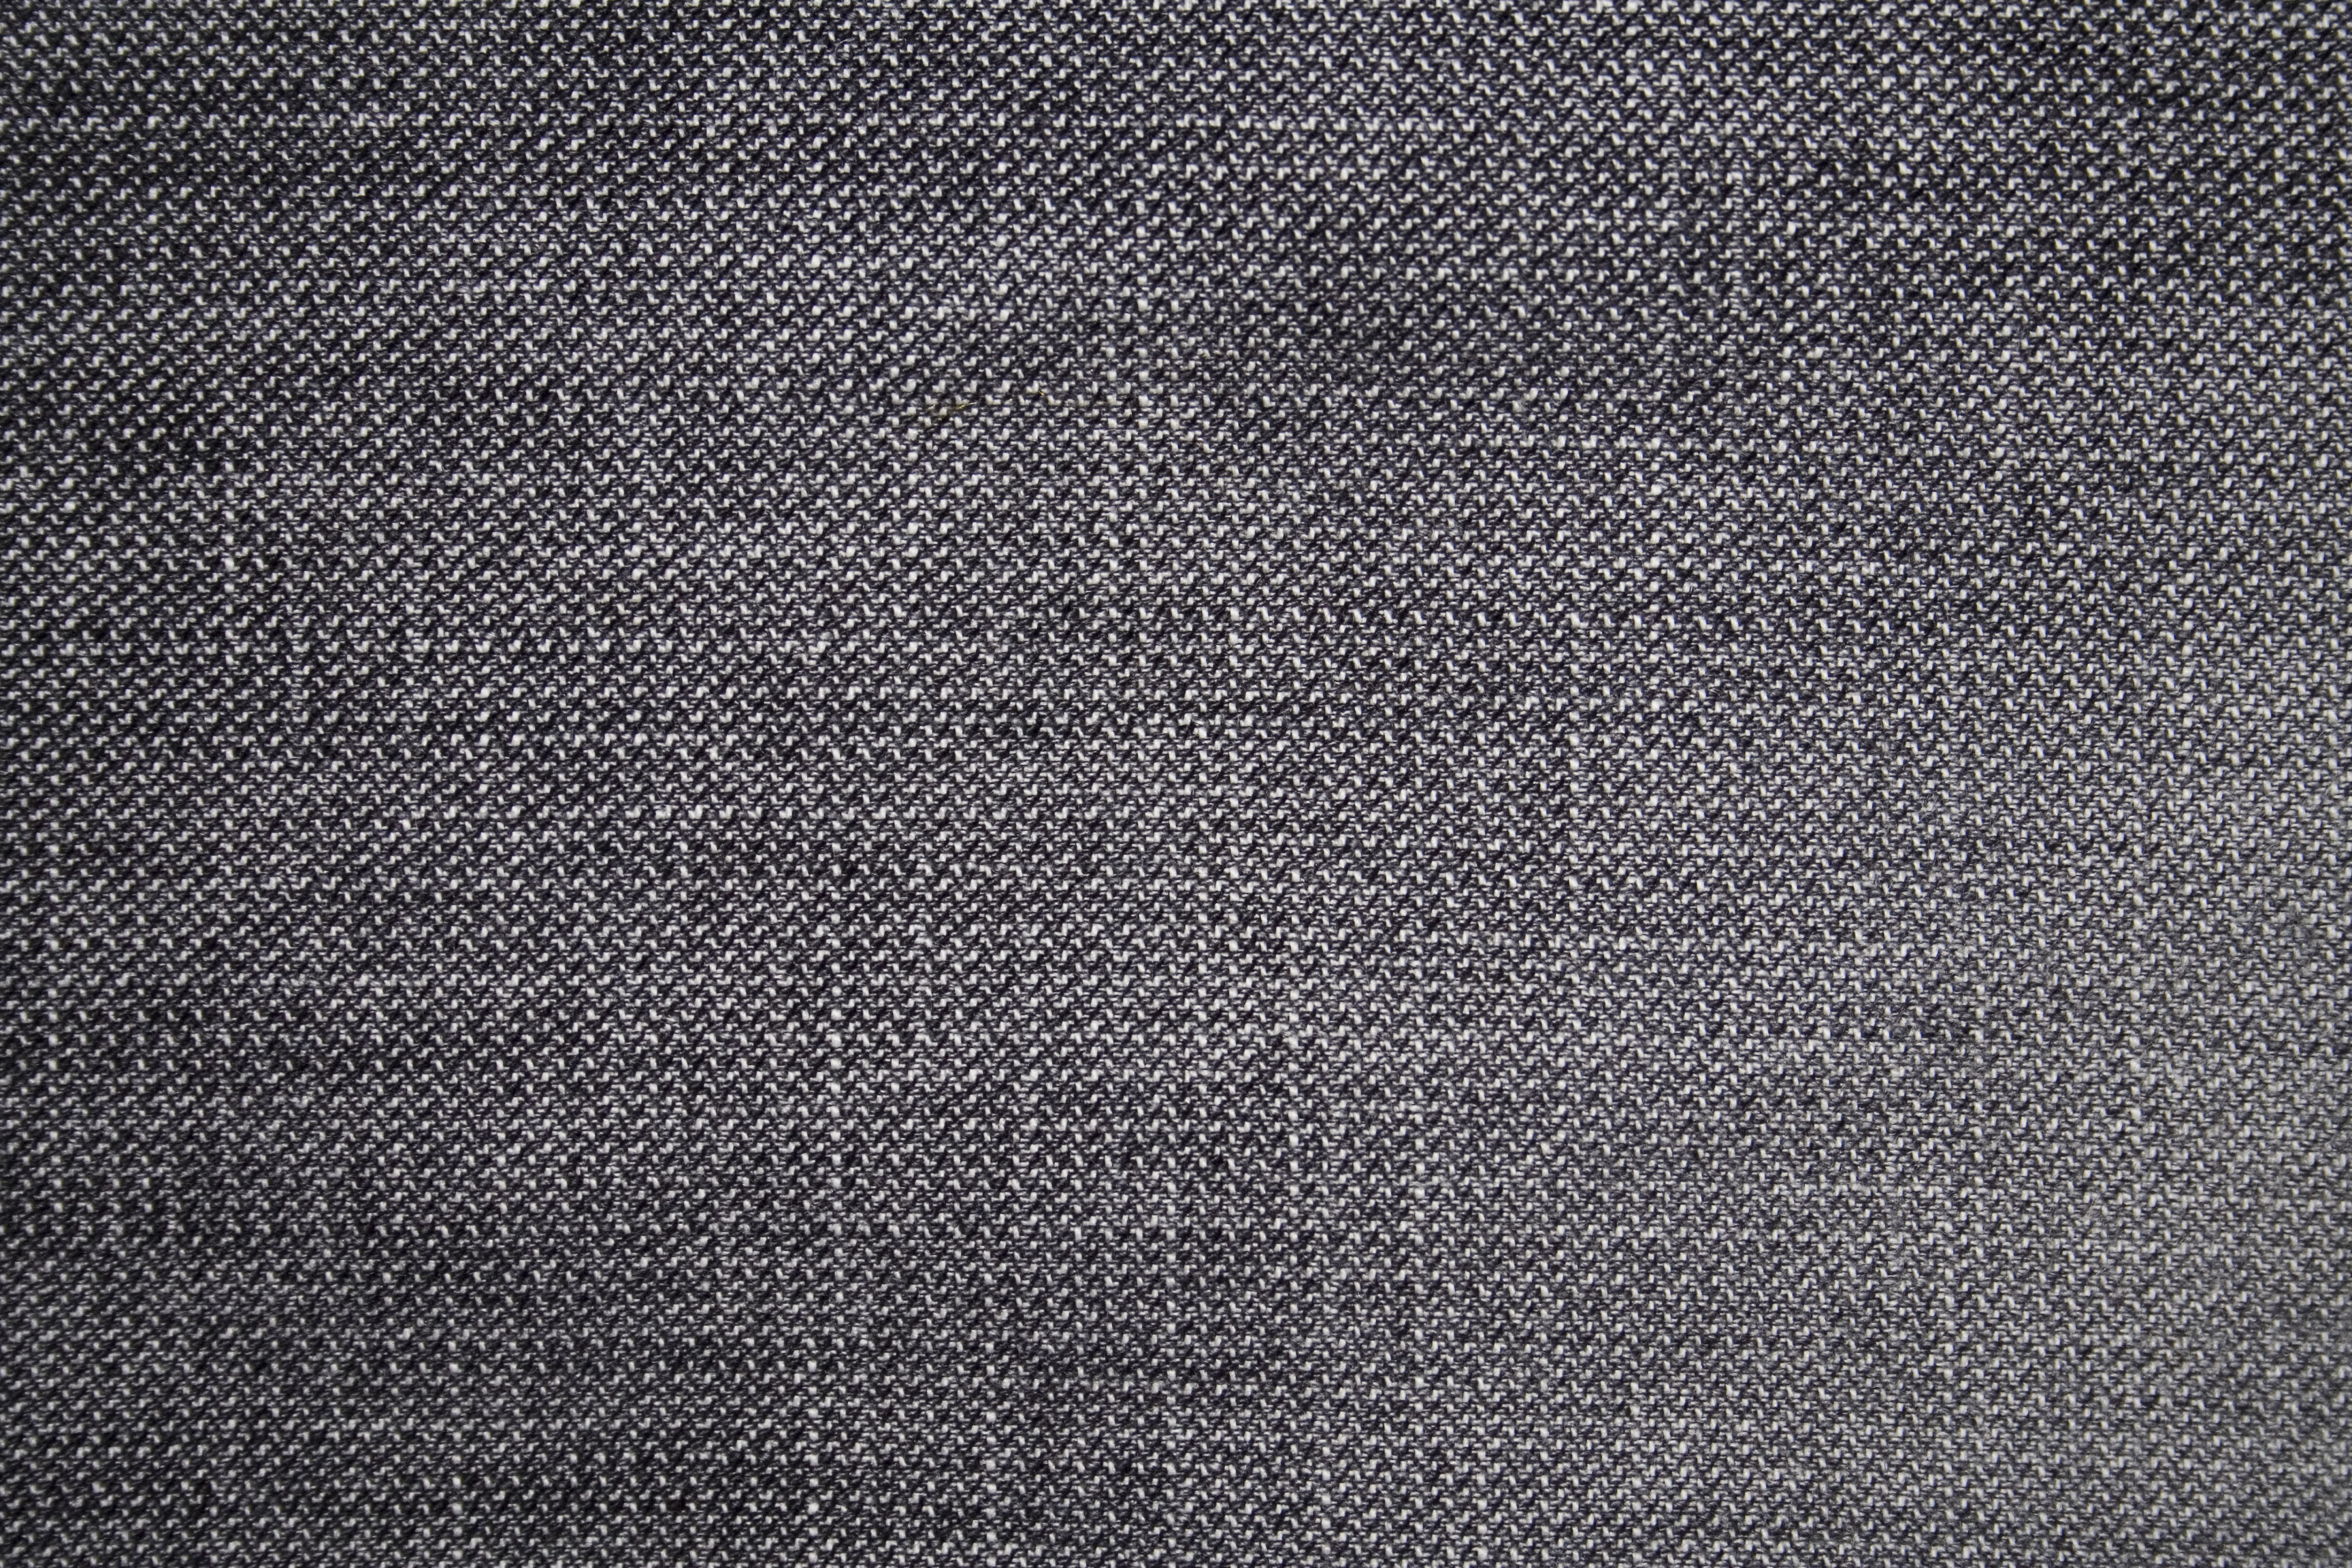 Farmer textile texture closeup